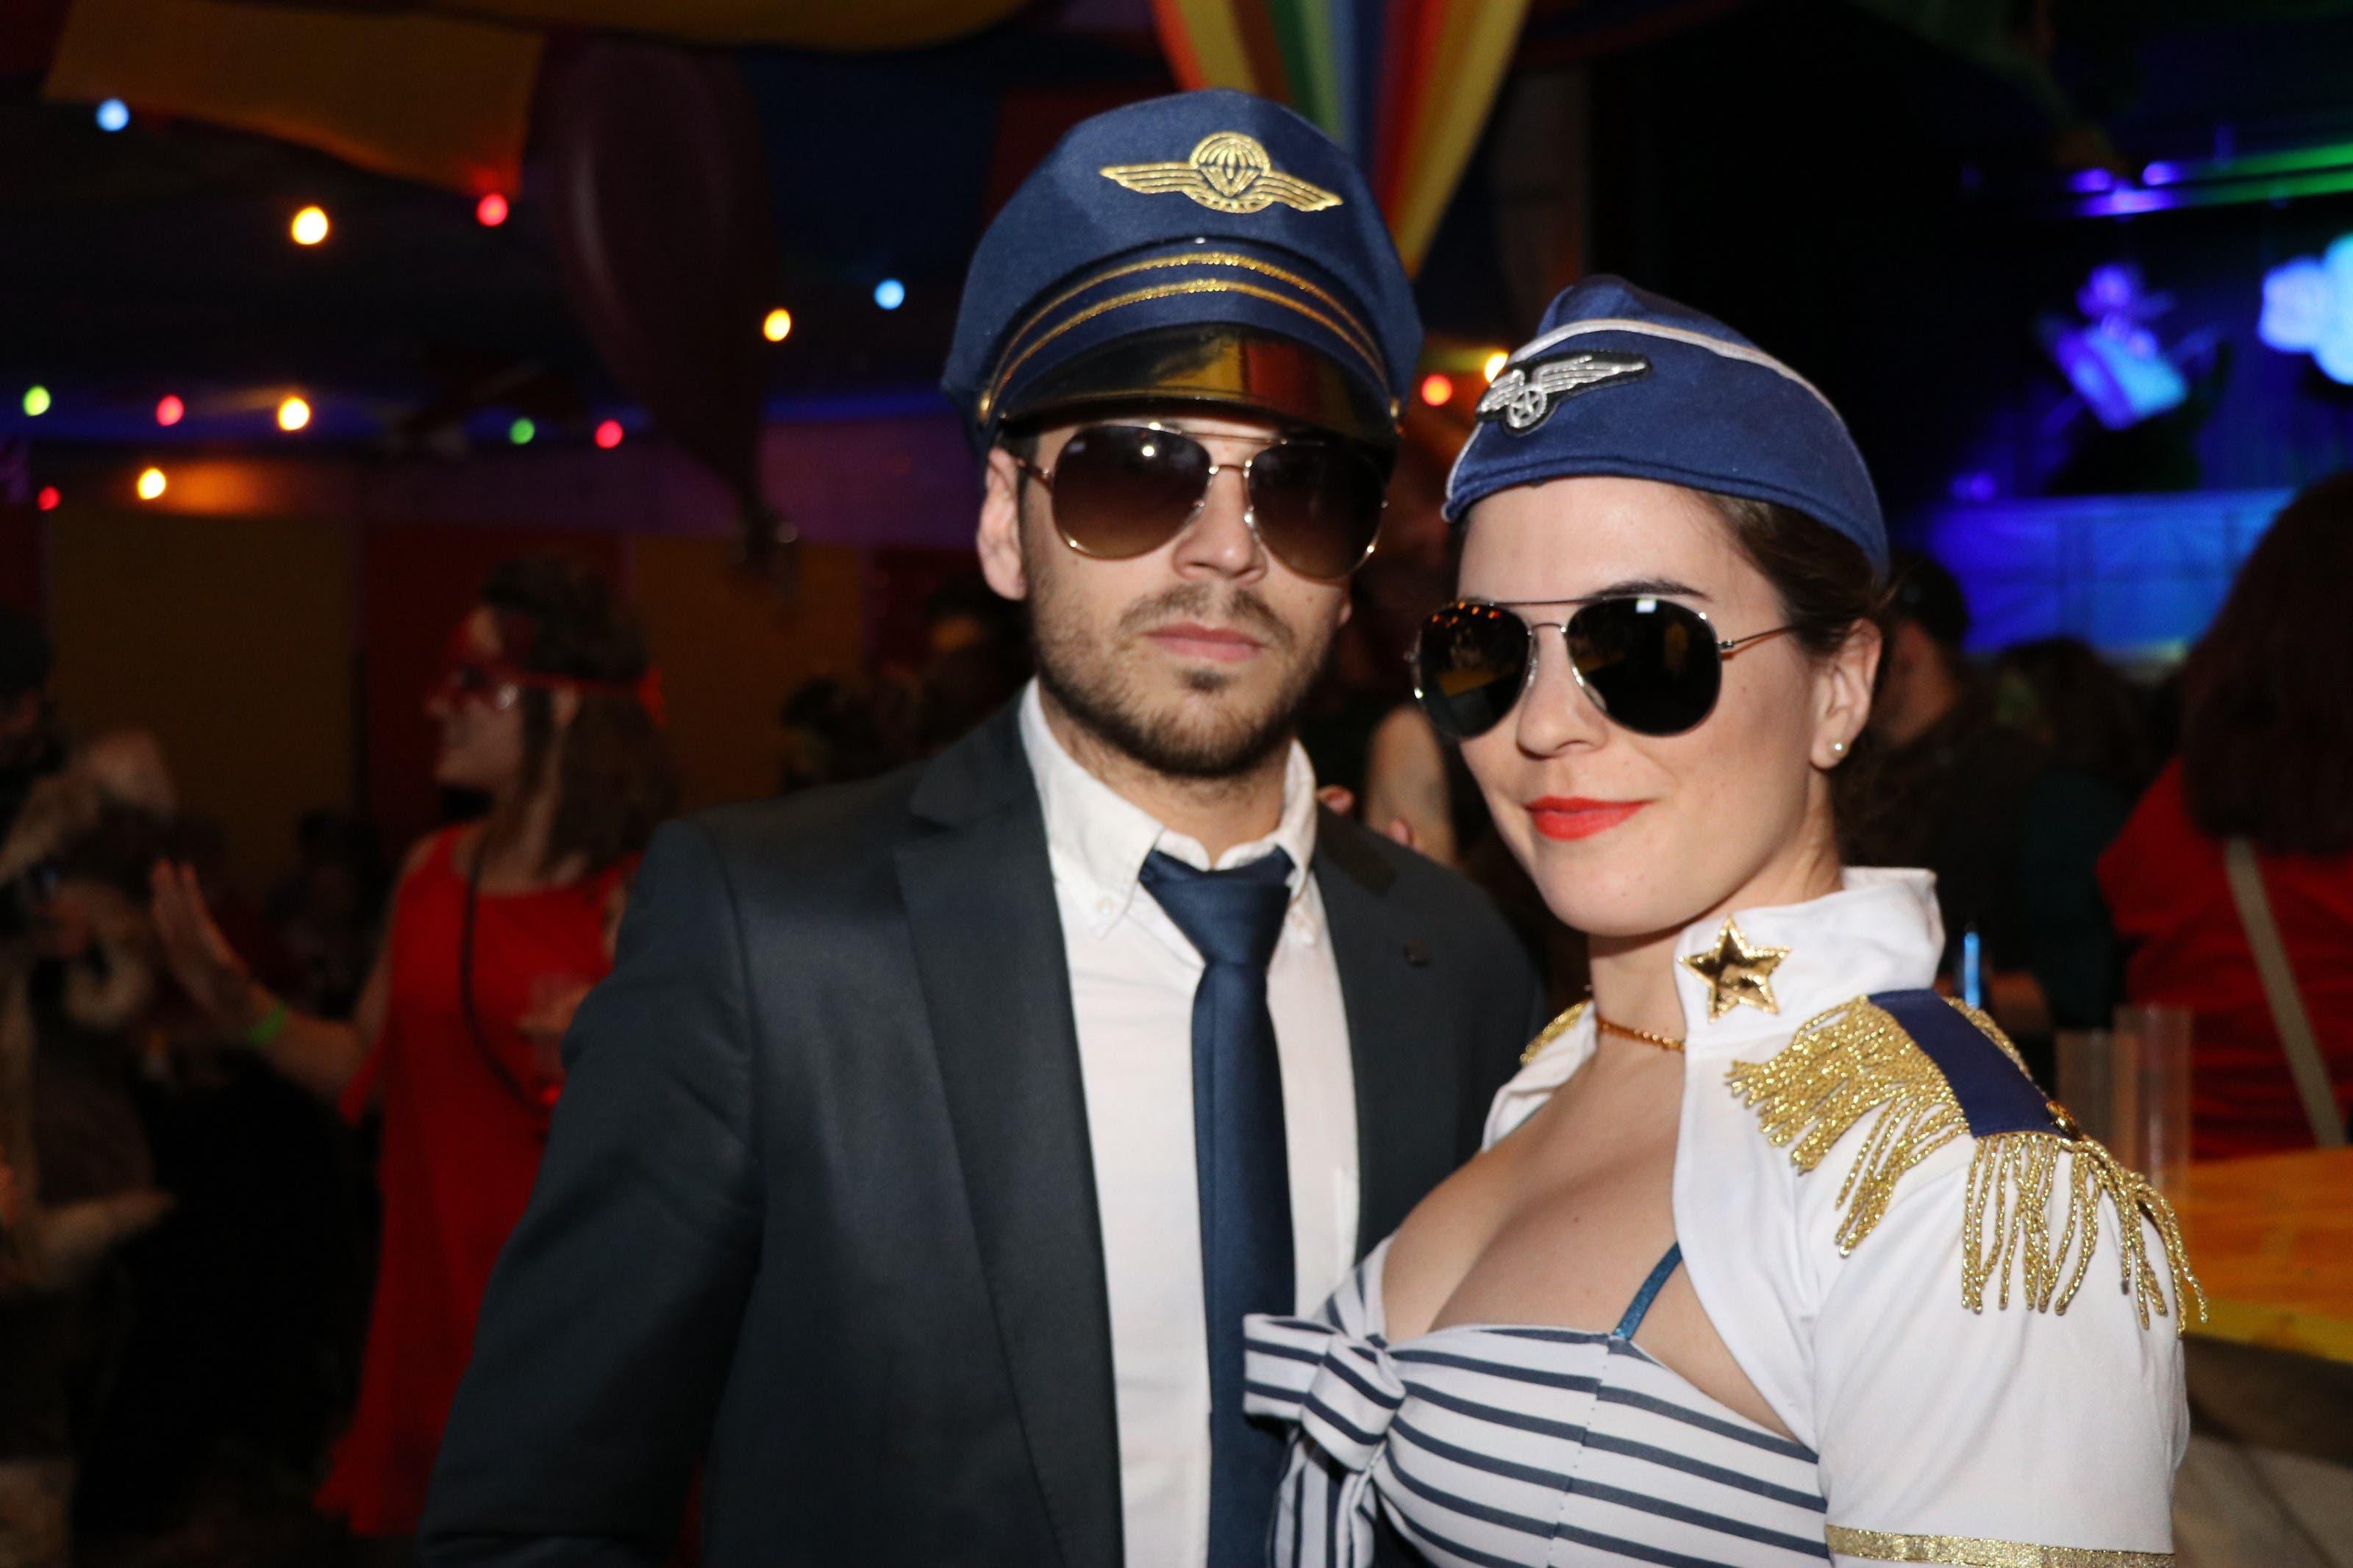 Flugzeugcrew Alessandro Facchinetti und Malanie von Ow